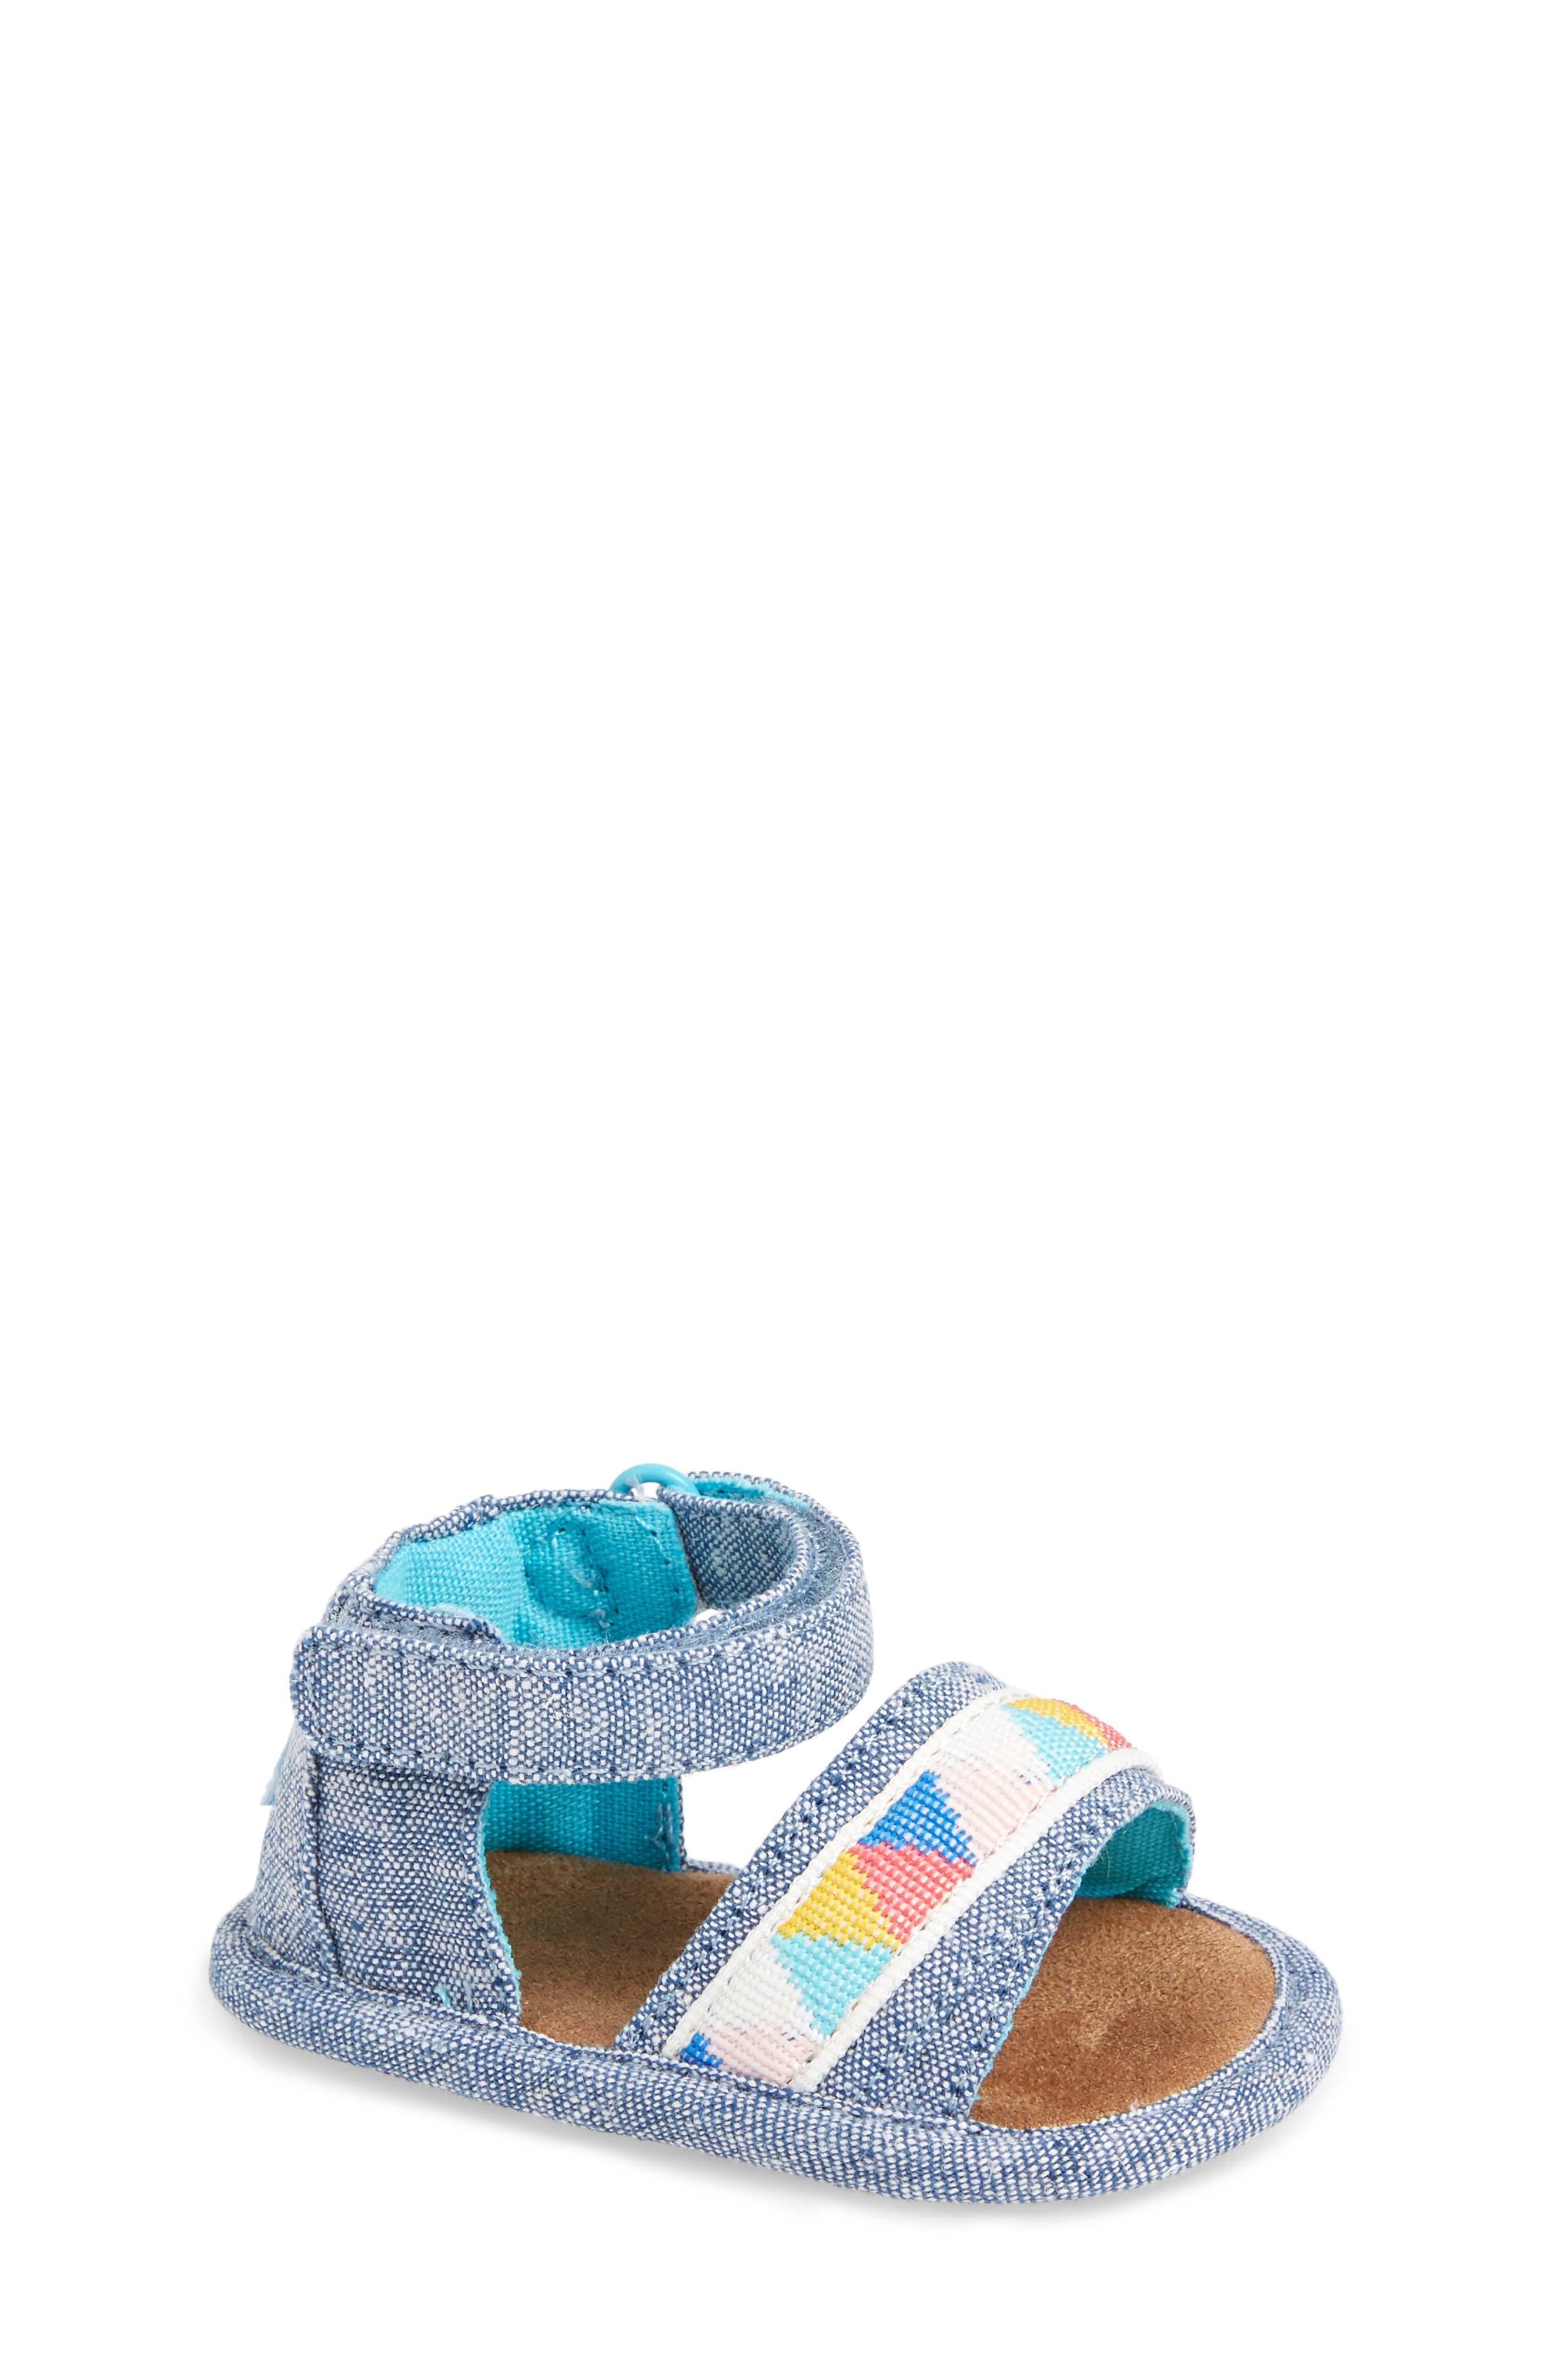 Shiloh Sandal,                         Main,                         color, Blue Slub Chambray/ Tribal